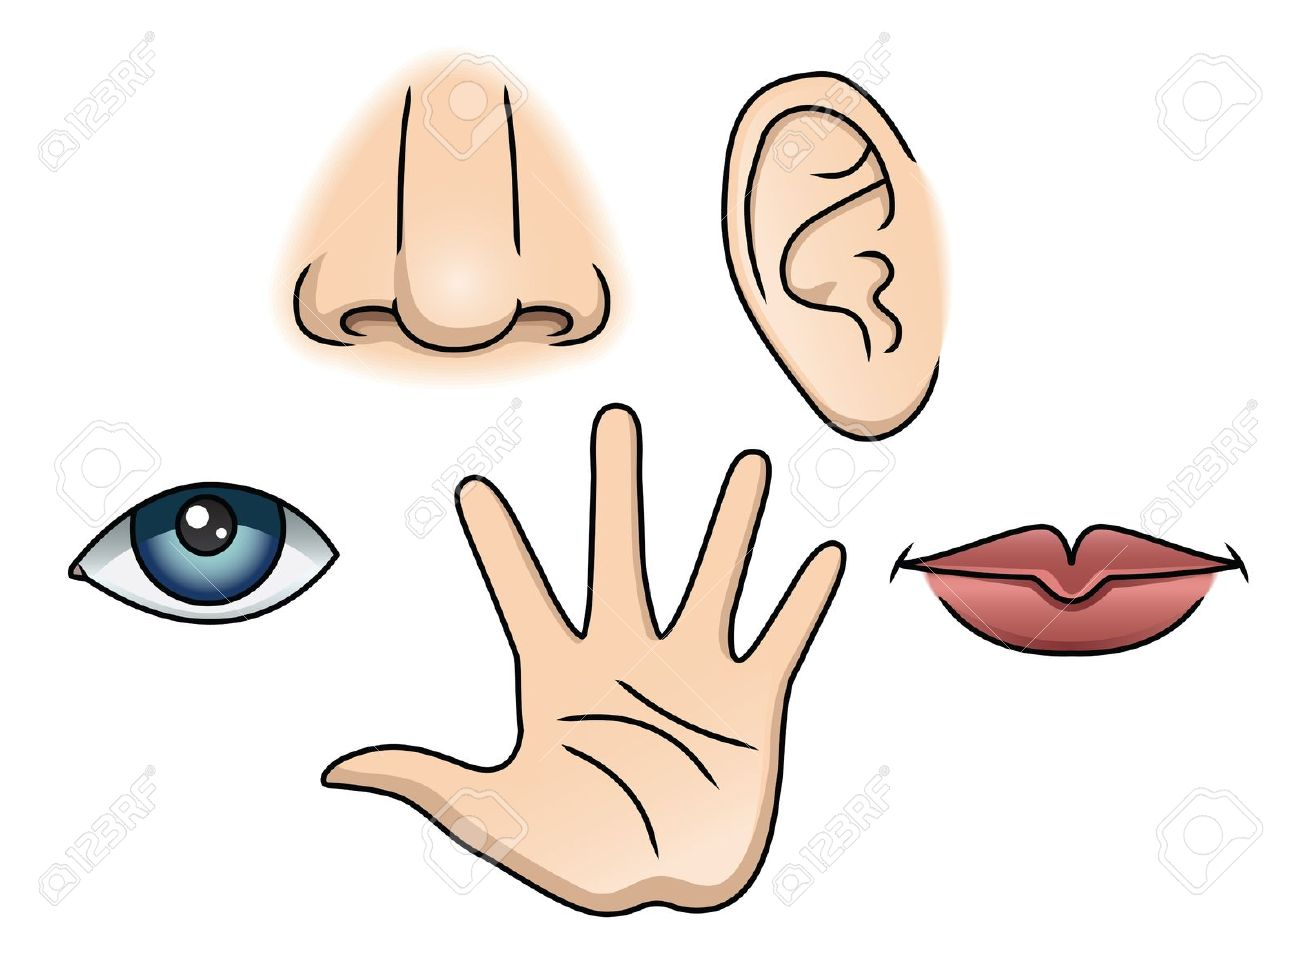 Five Senses Clip Art - .-Five senses clip art - .-8